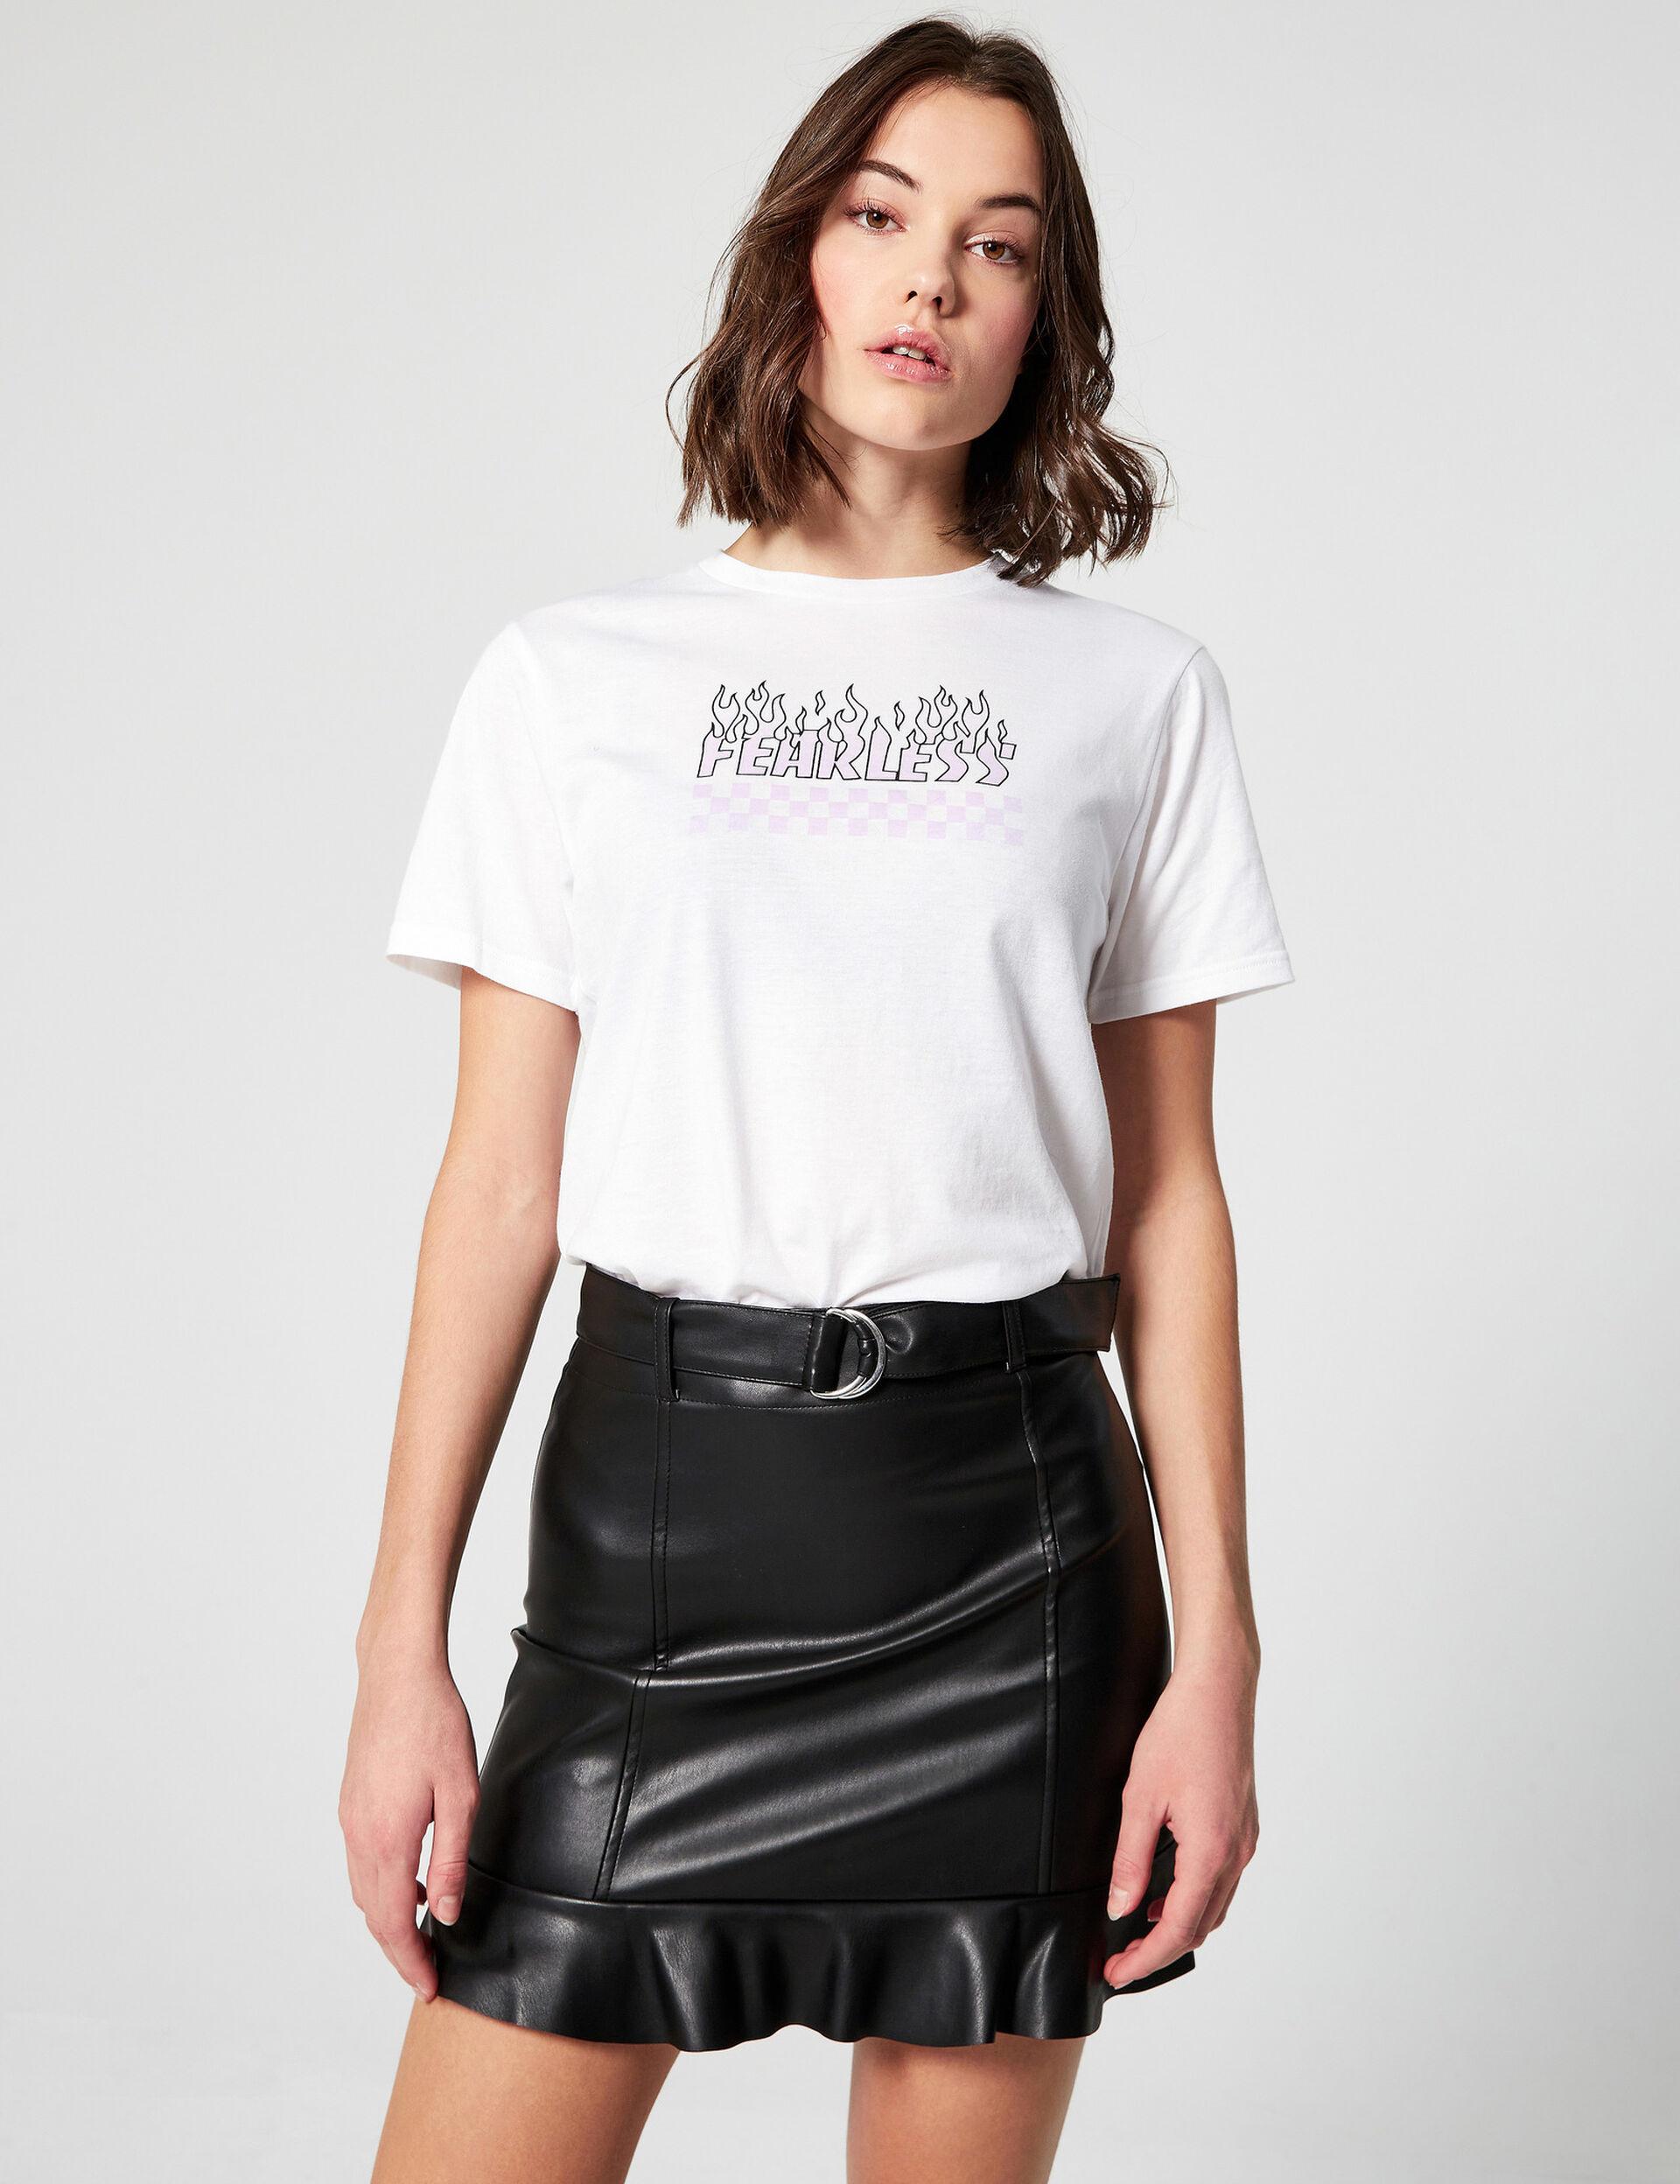 Tee-shirt loose fearless